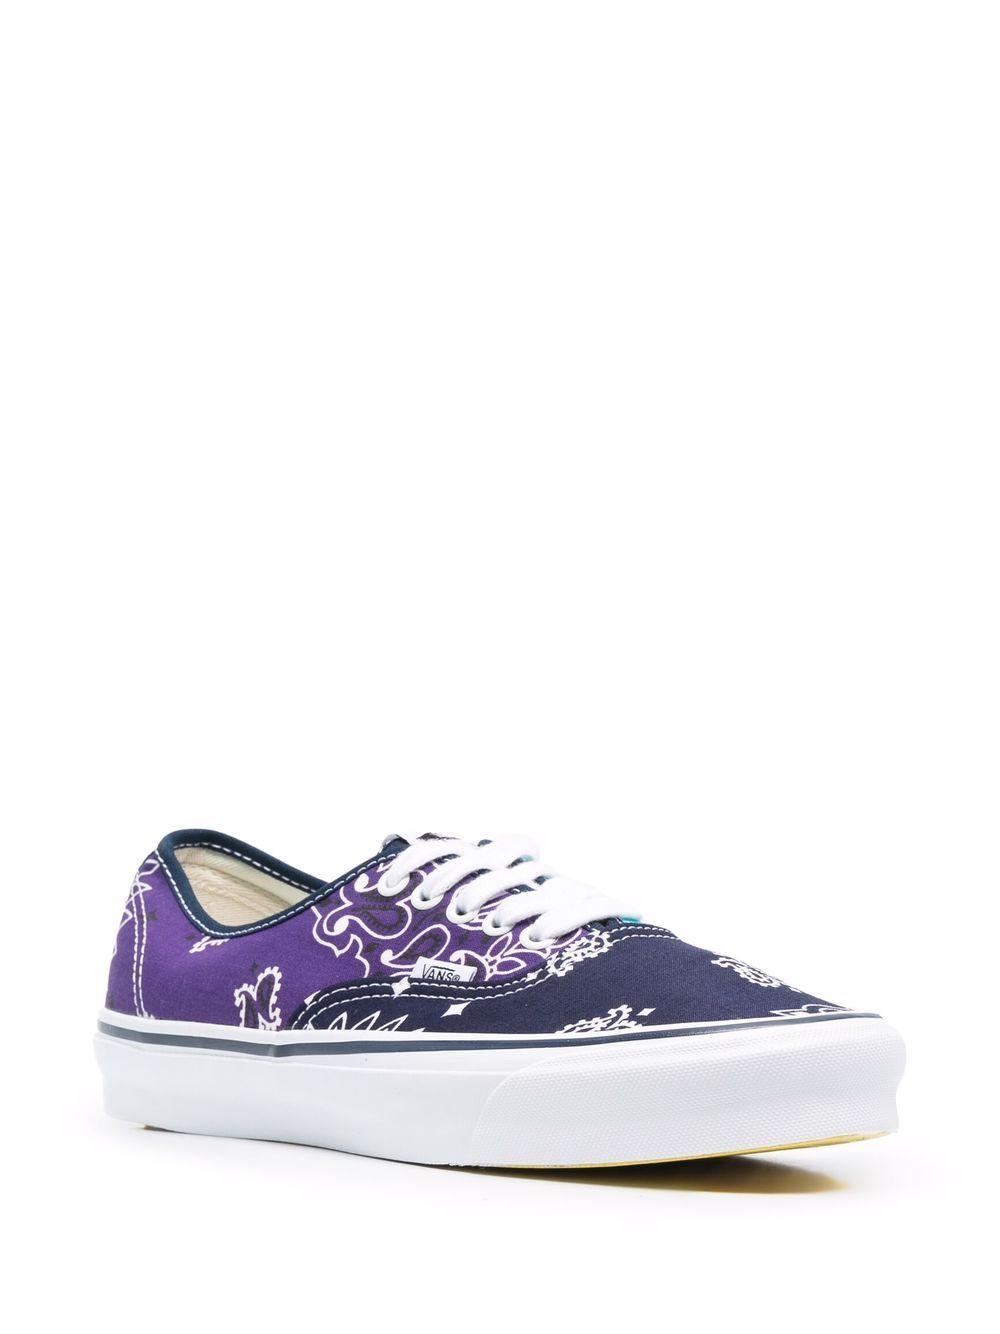 sneakers authentic lx og uomo viola VANS VAULT X BEDWIN | Sneakers | VN0A4BV99R91